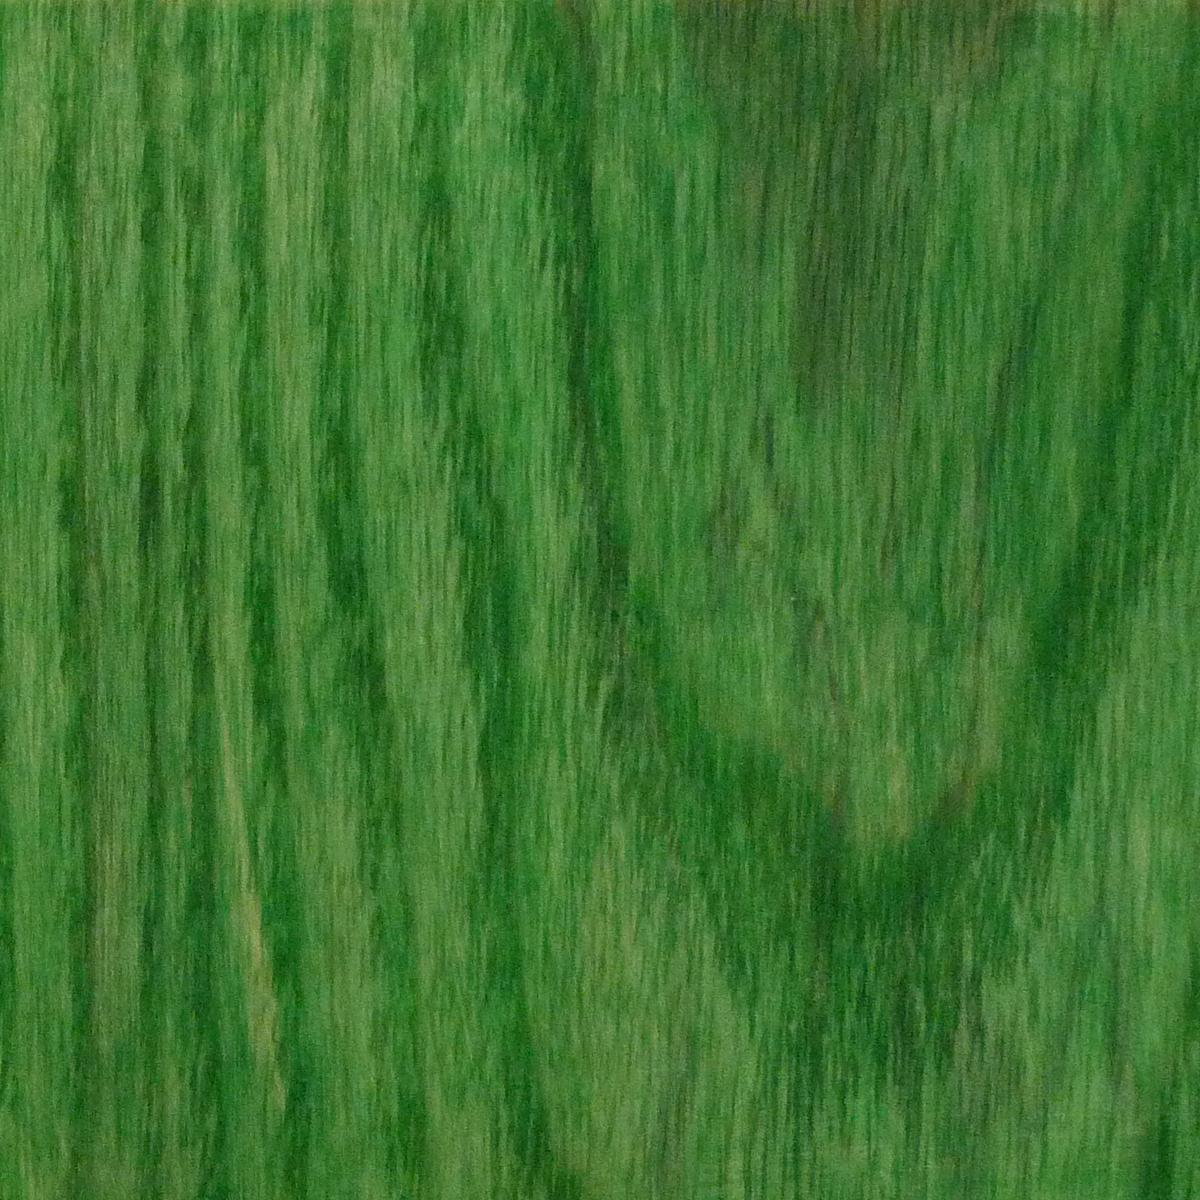 Green (Lime) - CC279.jpg